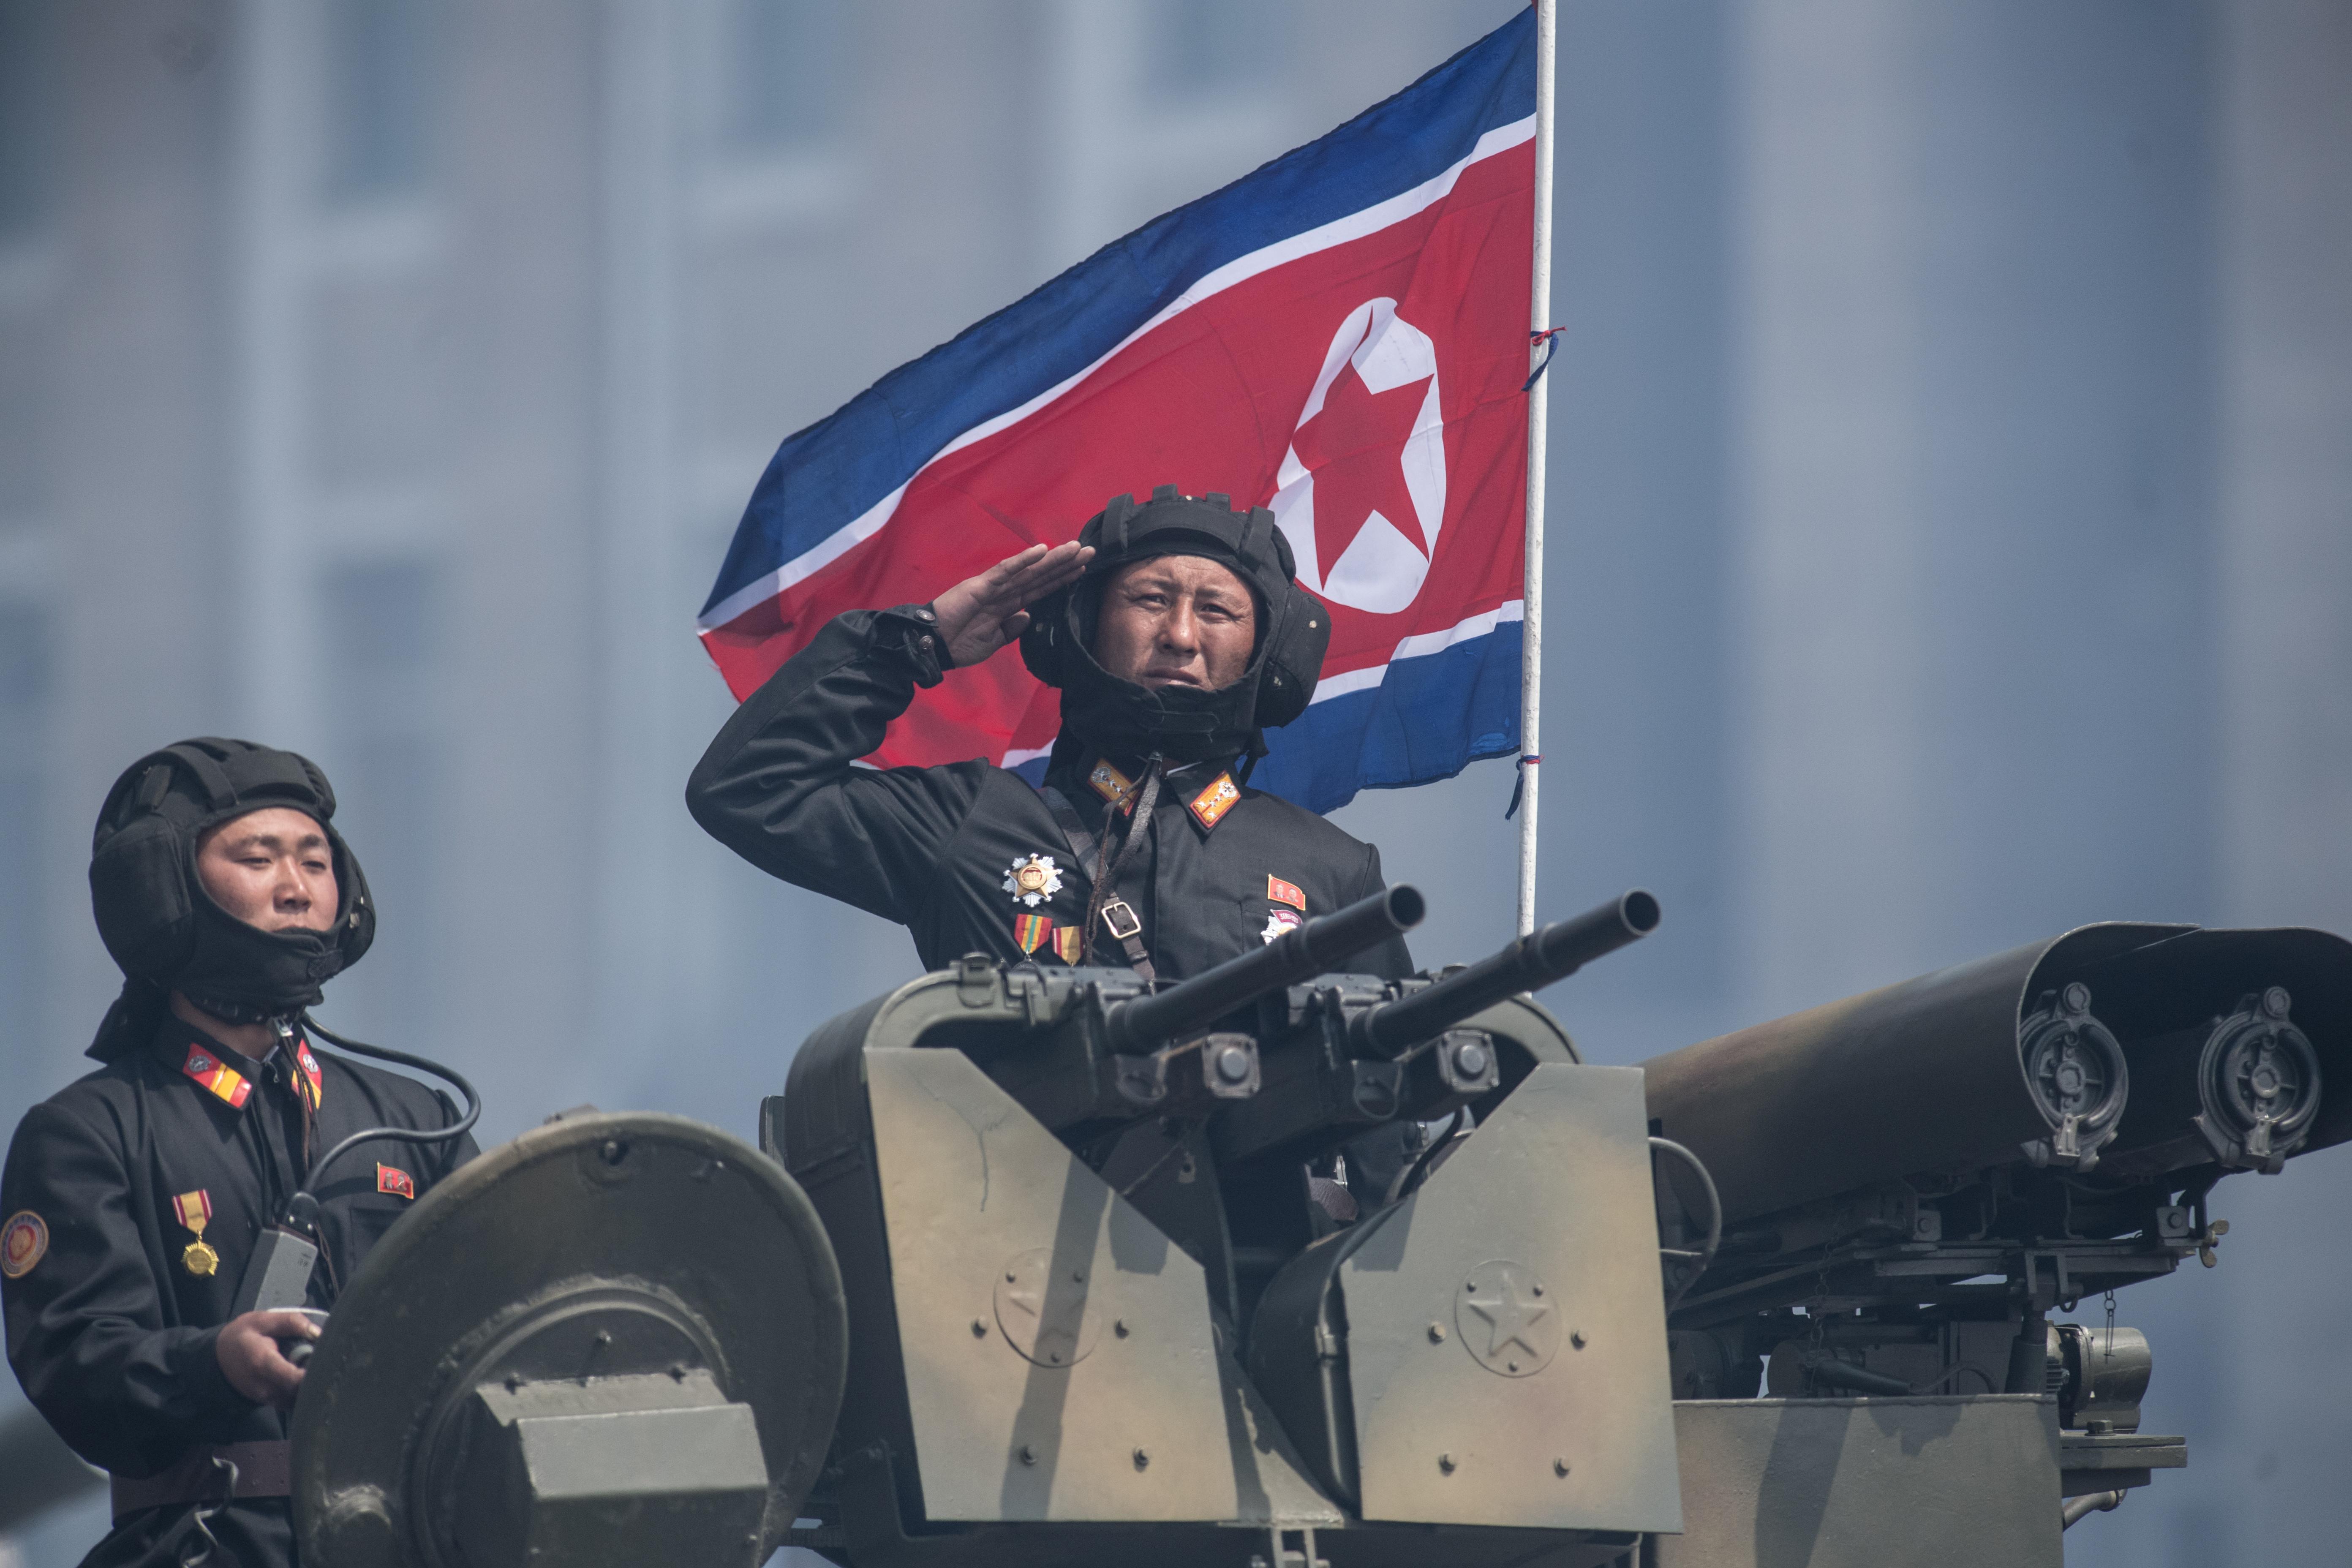 <p>Фото: &copy; РИА Новости/<span>Илья Питалев</span></p>